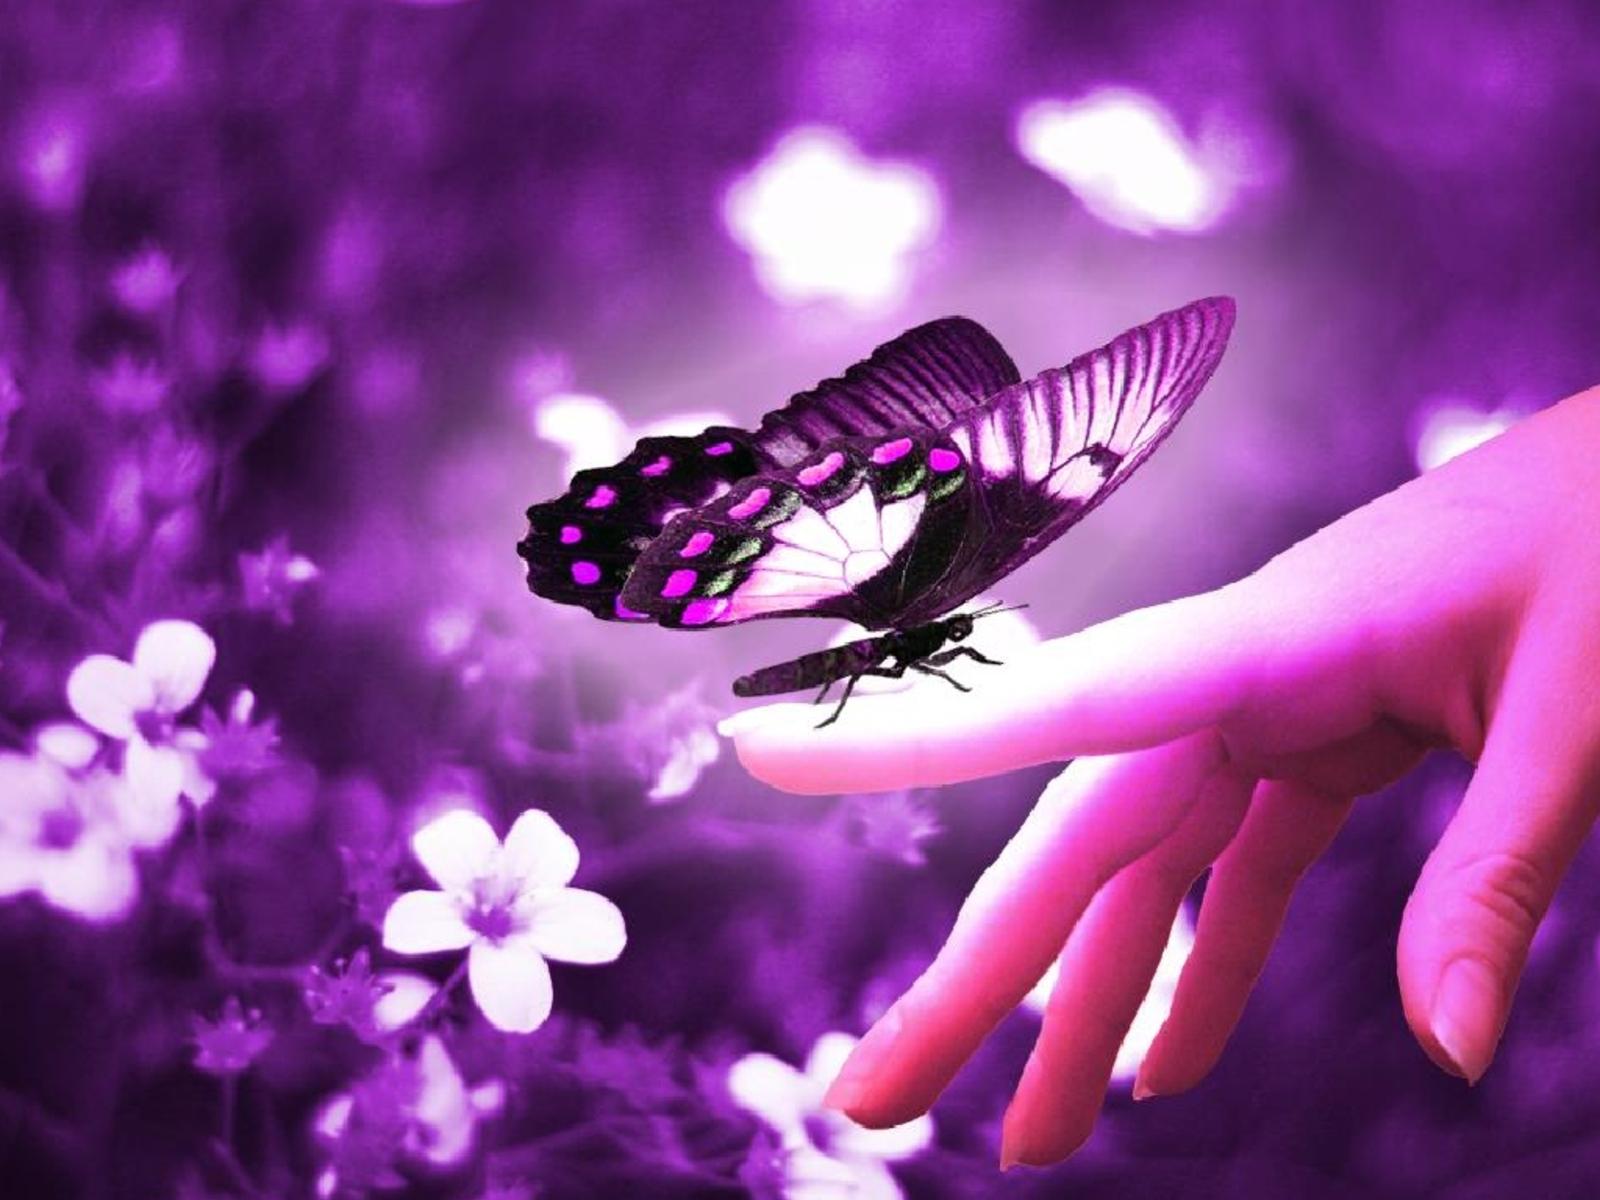 butterflies free download